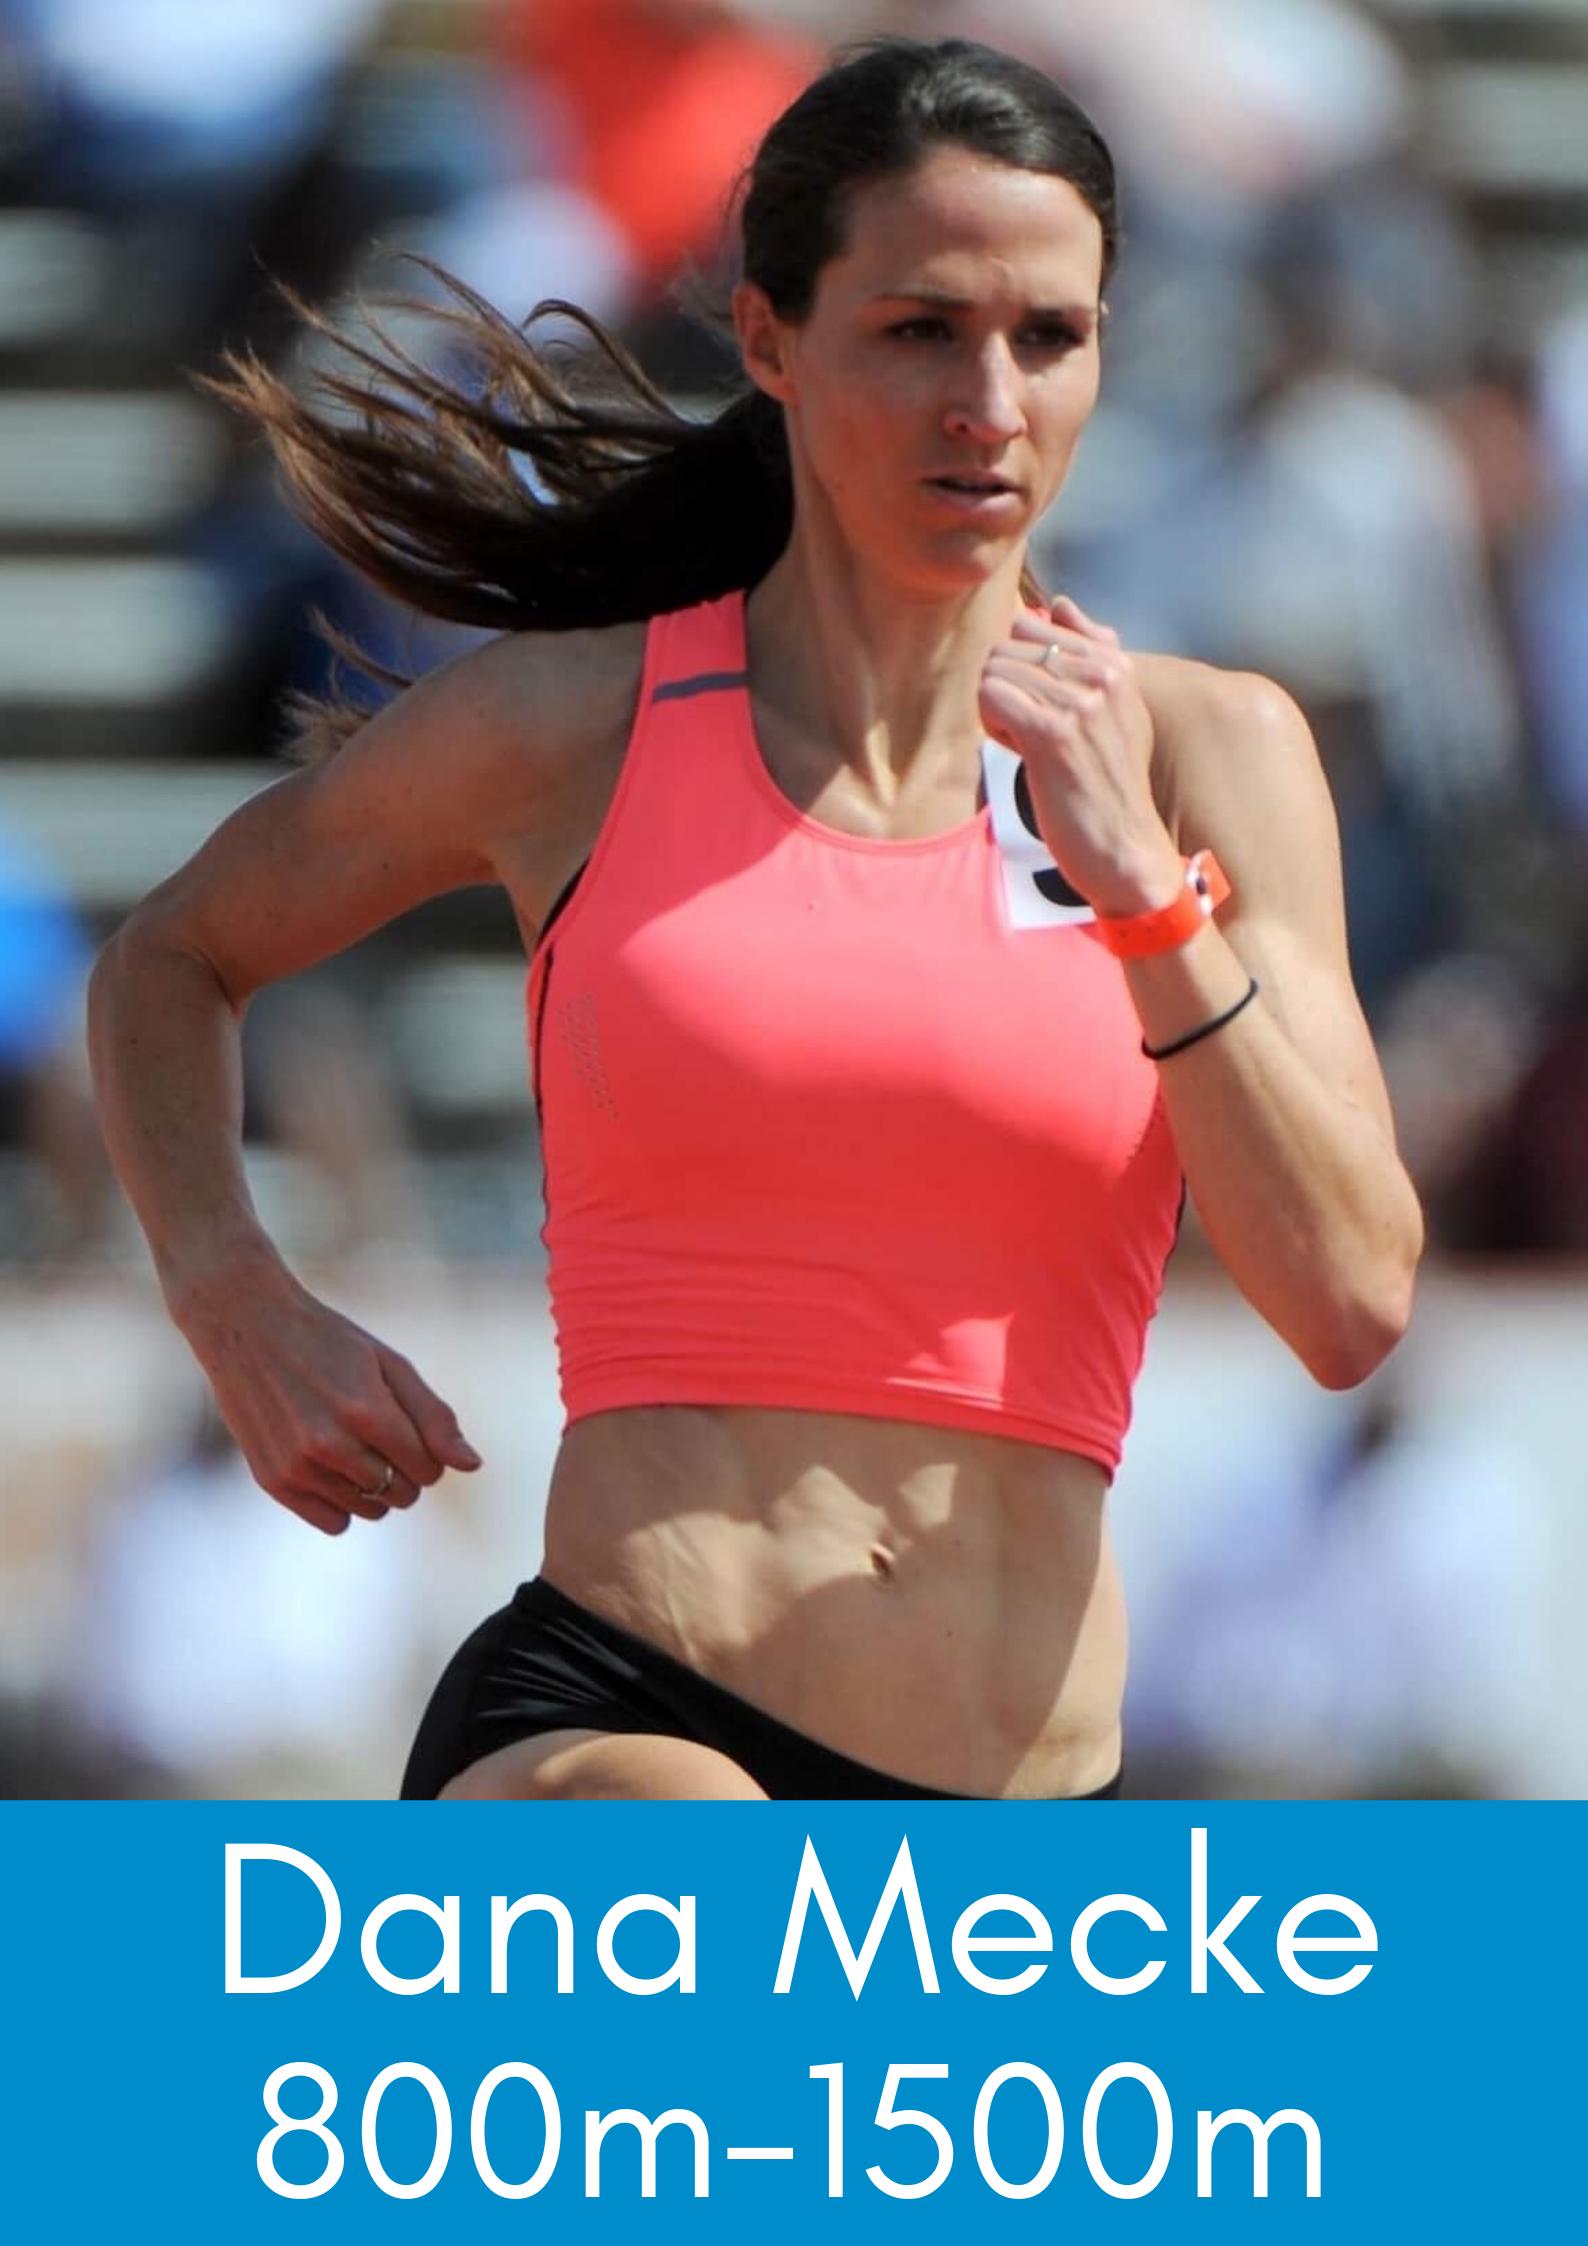 Dana Mecke